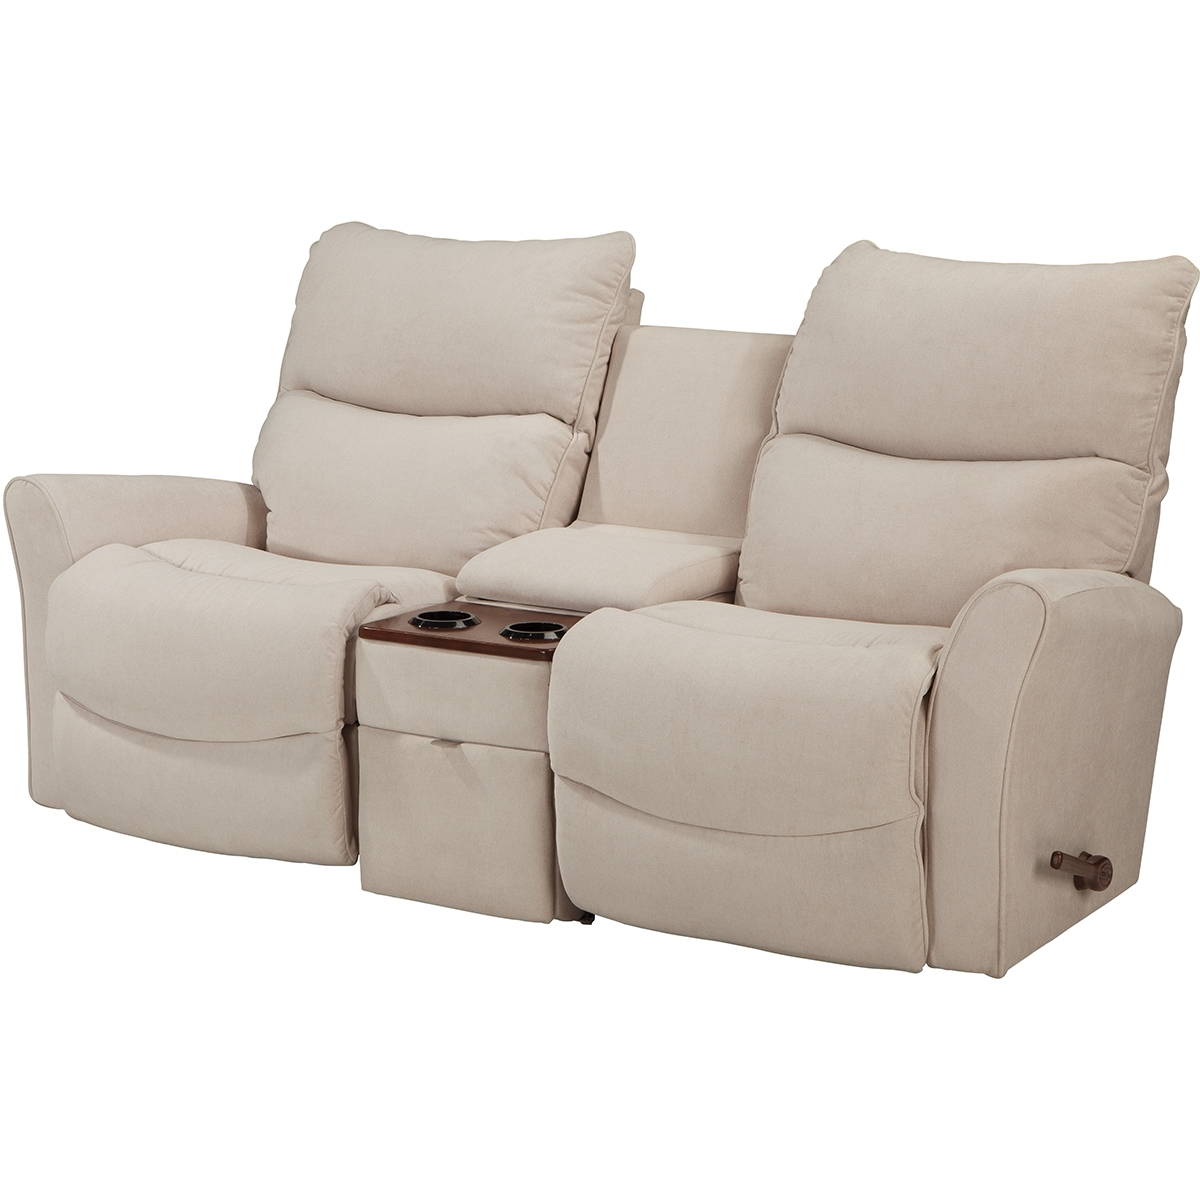 La Z Boy Sectional Sofas Inside Well Known Sectional Sofas & Sectional Couches (View 6 of 15)